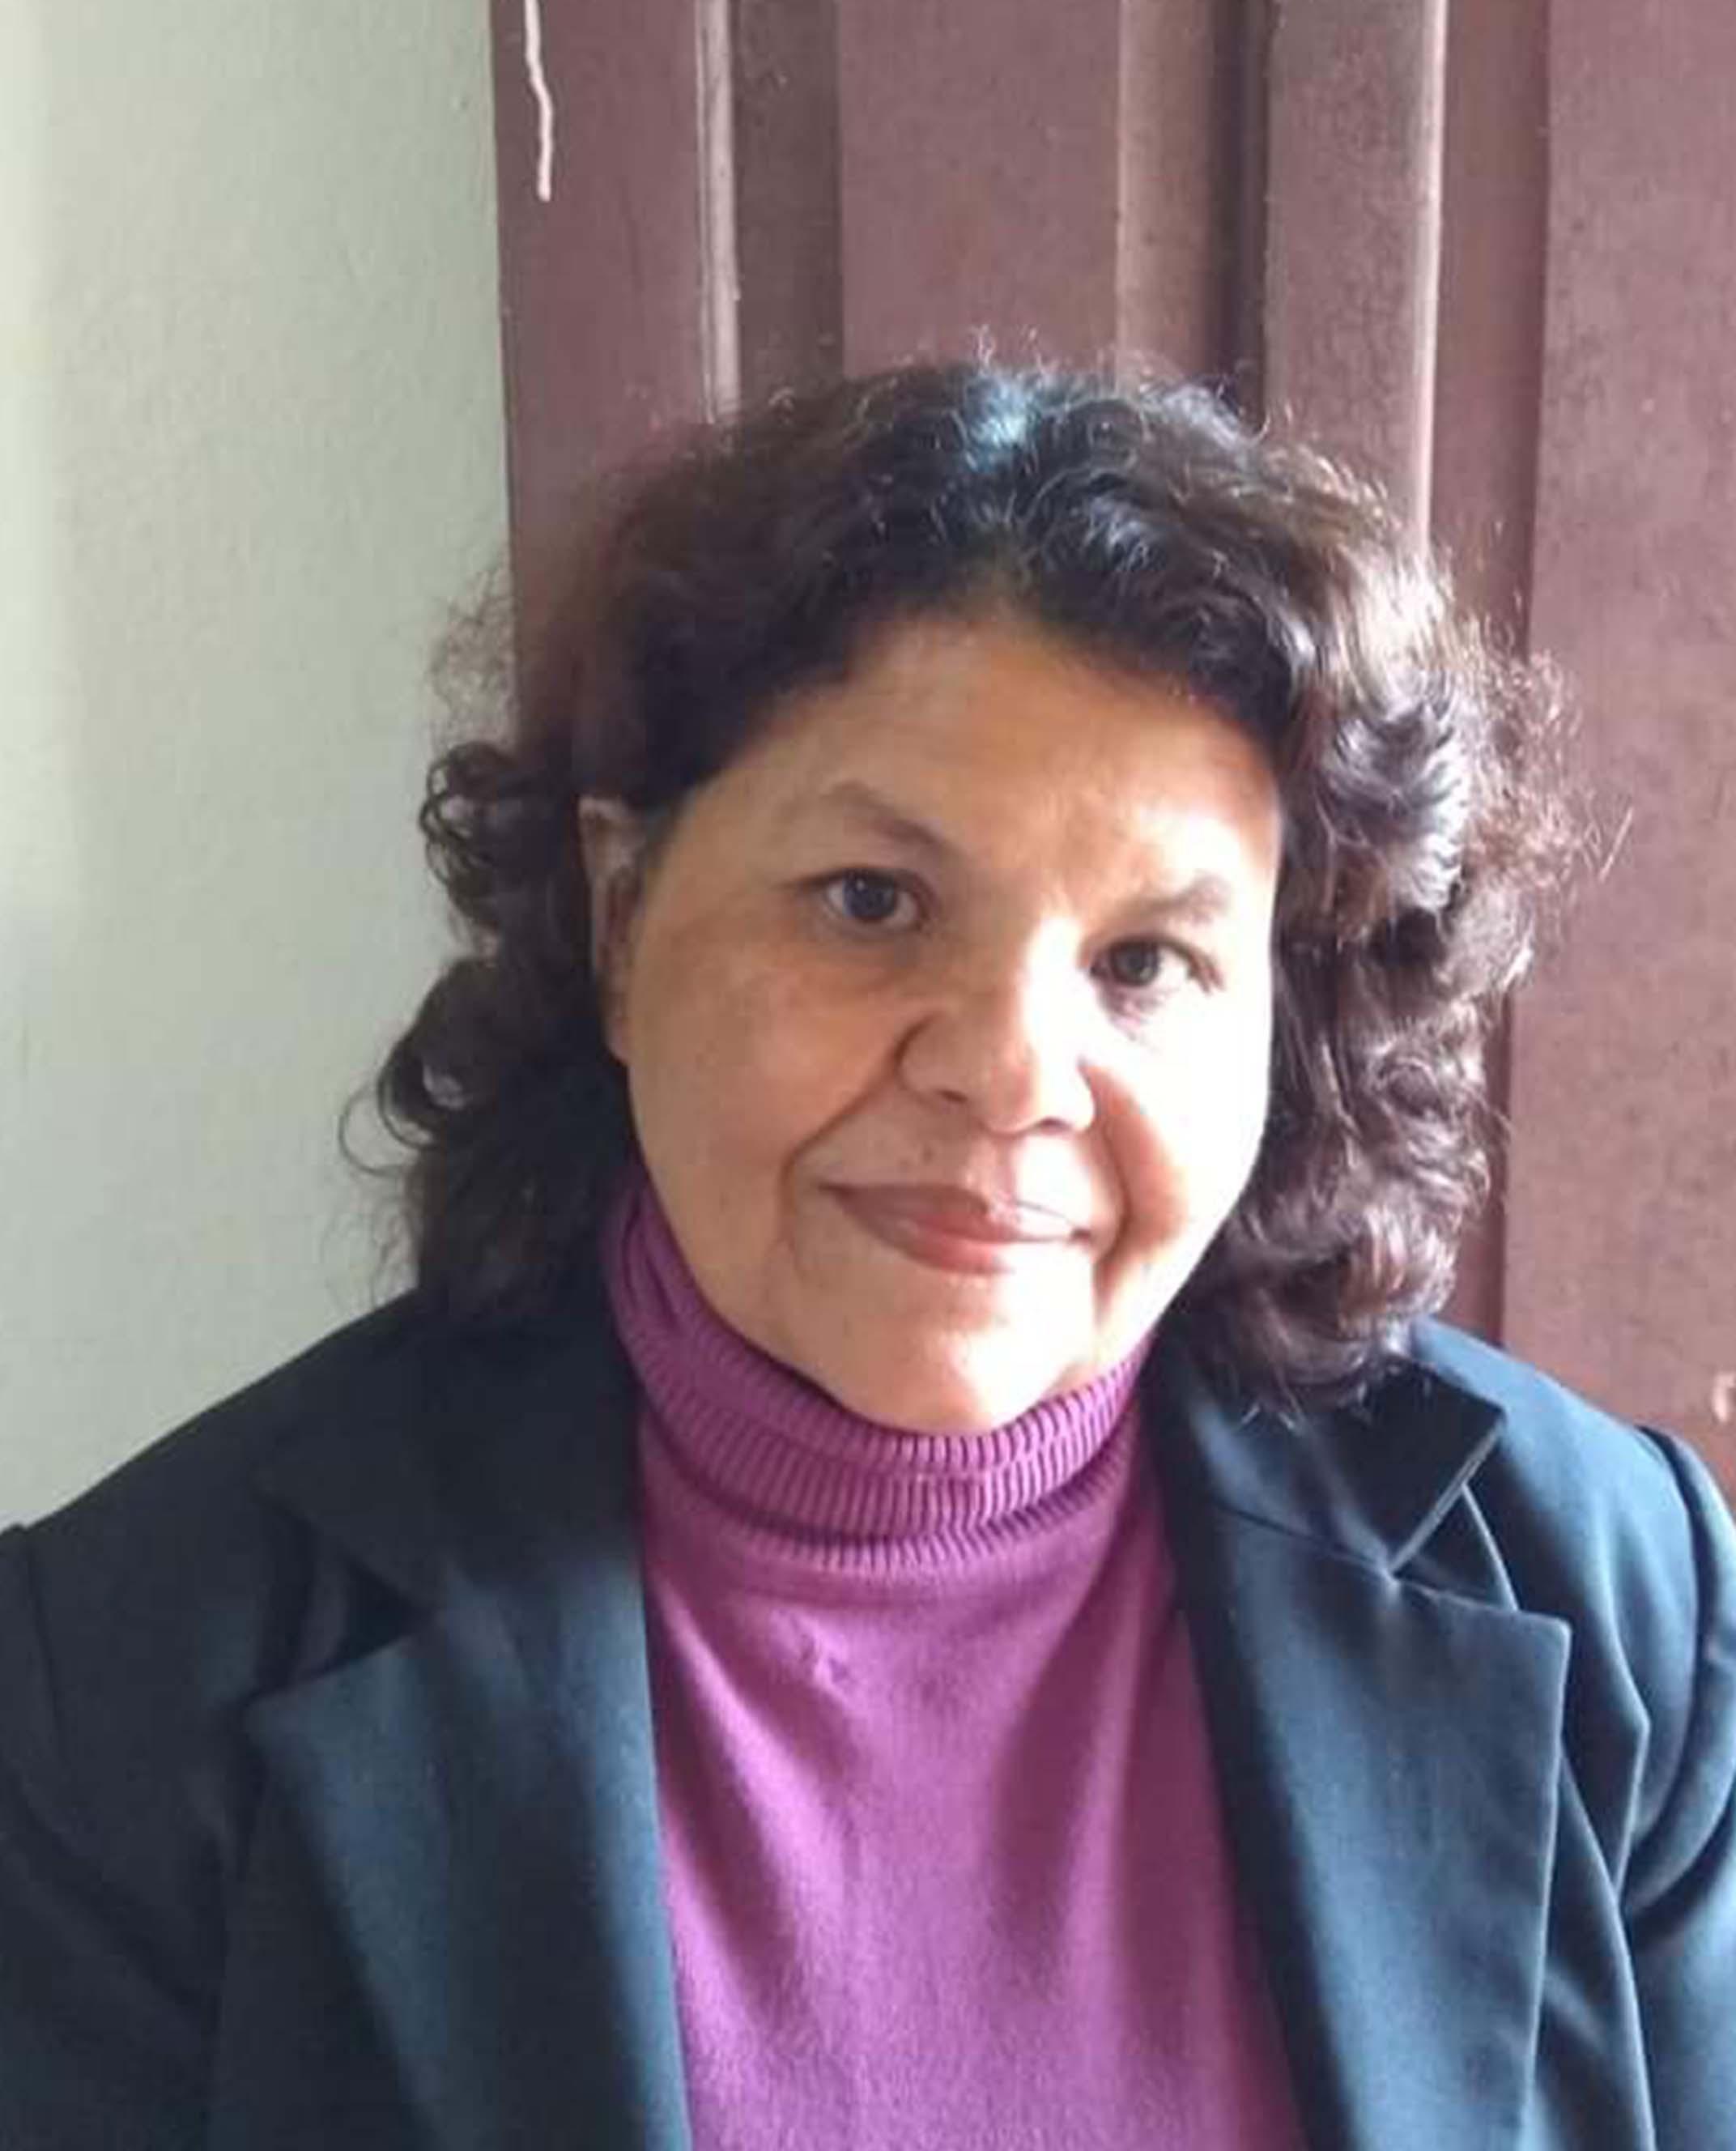 NILZA MARIA DE SOUZA - Arquidiocese de Londrina